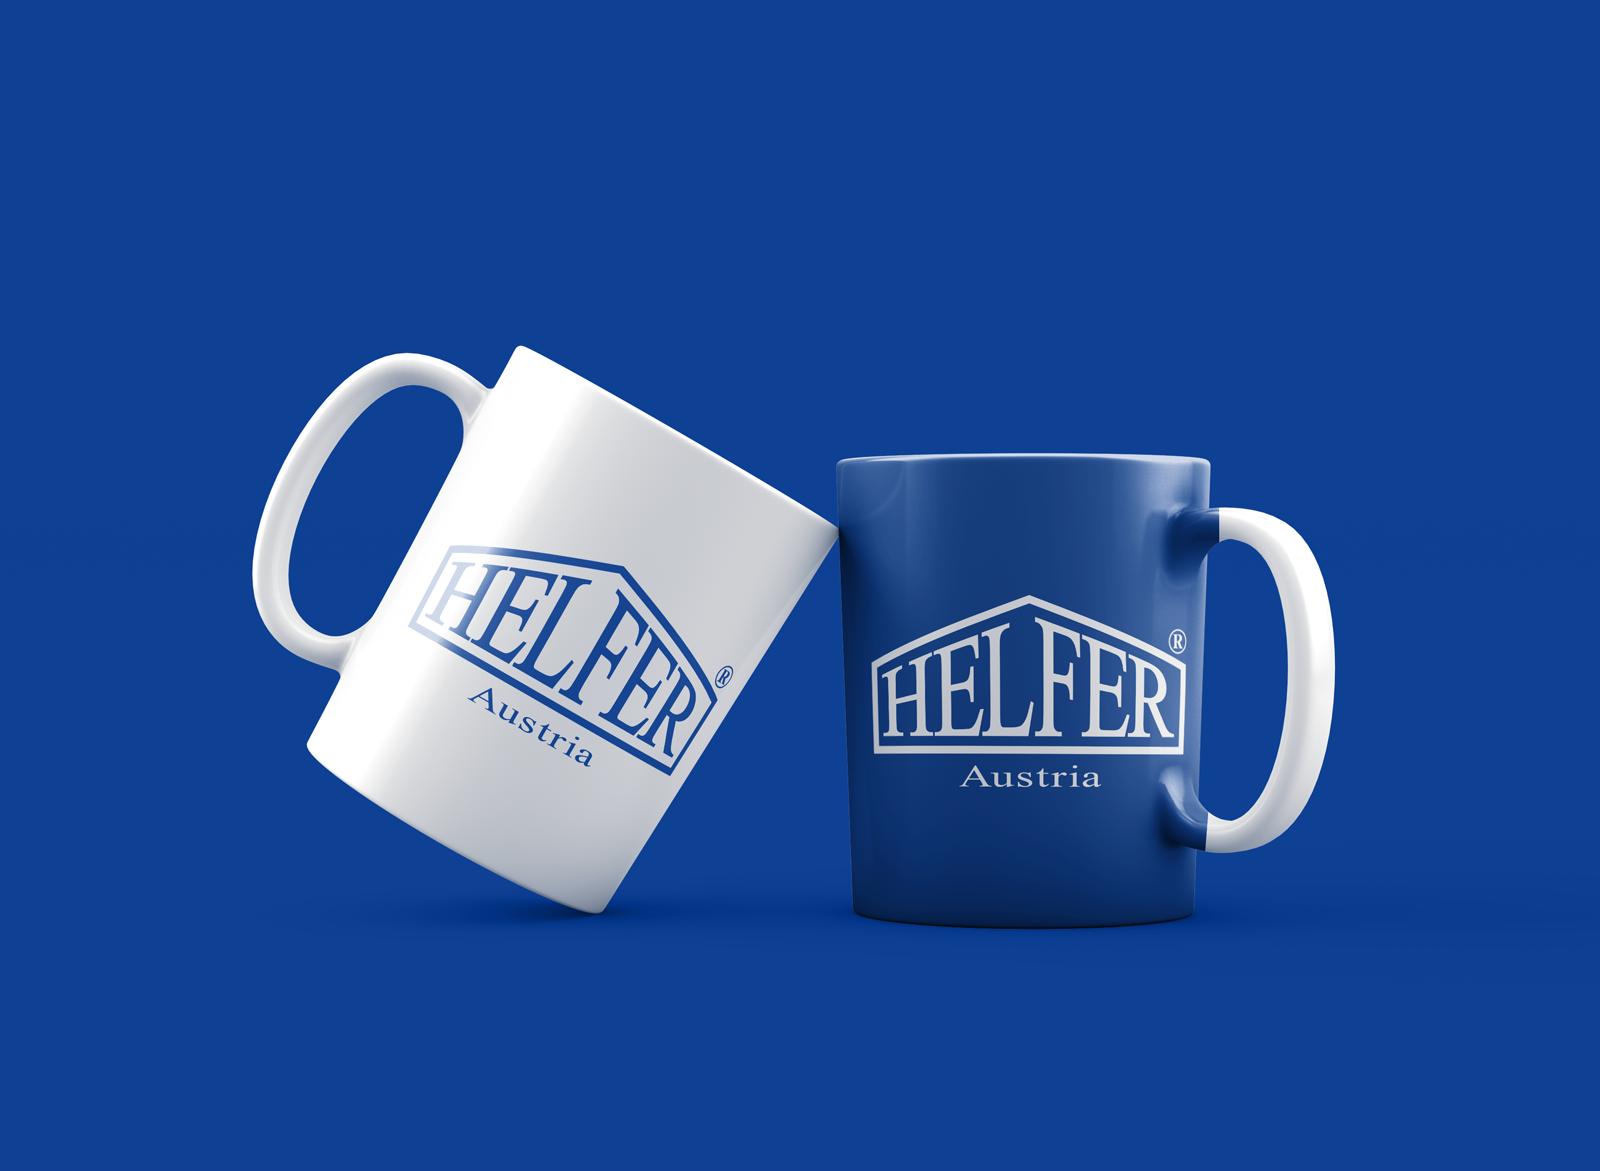 Разработка Интернет-Магазина Для Бренда Helfer